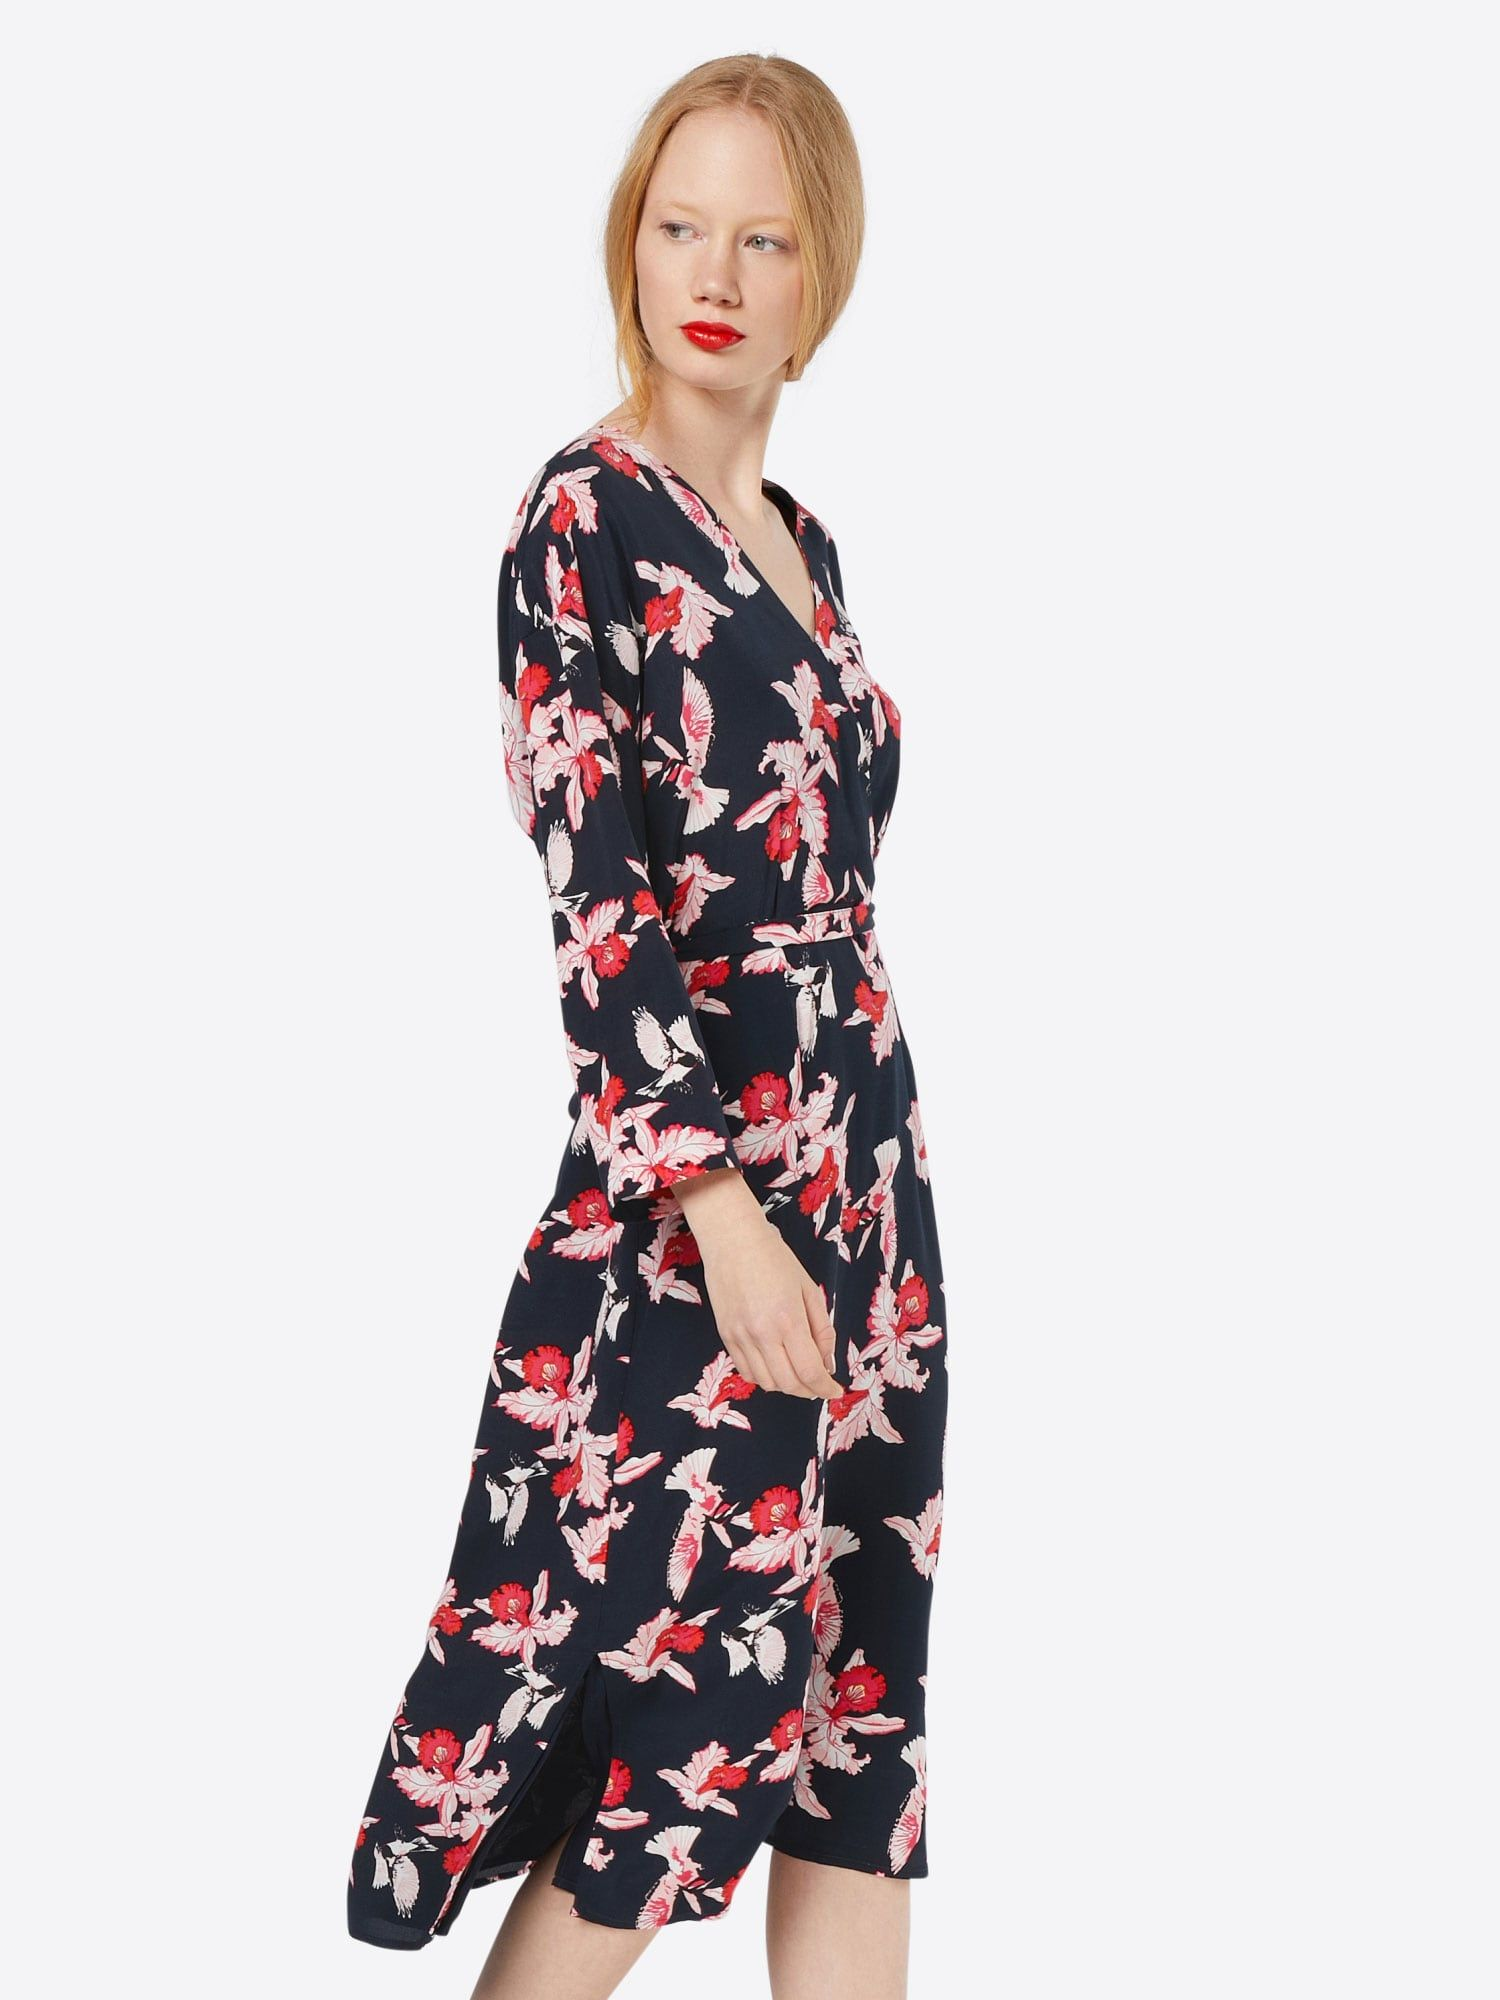 Modström Kleid 'Fedora' Damen, Navy / Altrosa / Rot, Größe 38 #fedoras